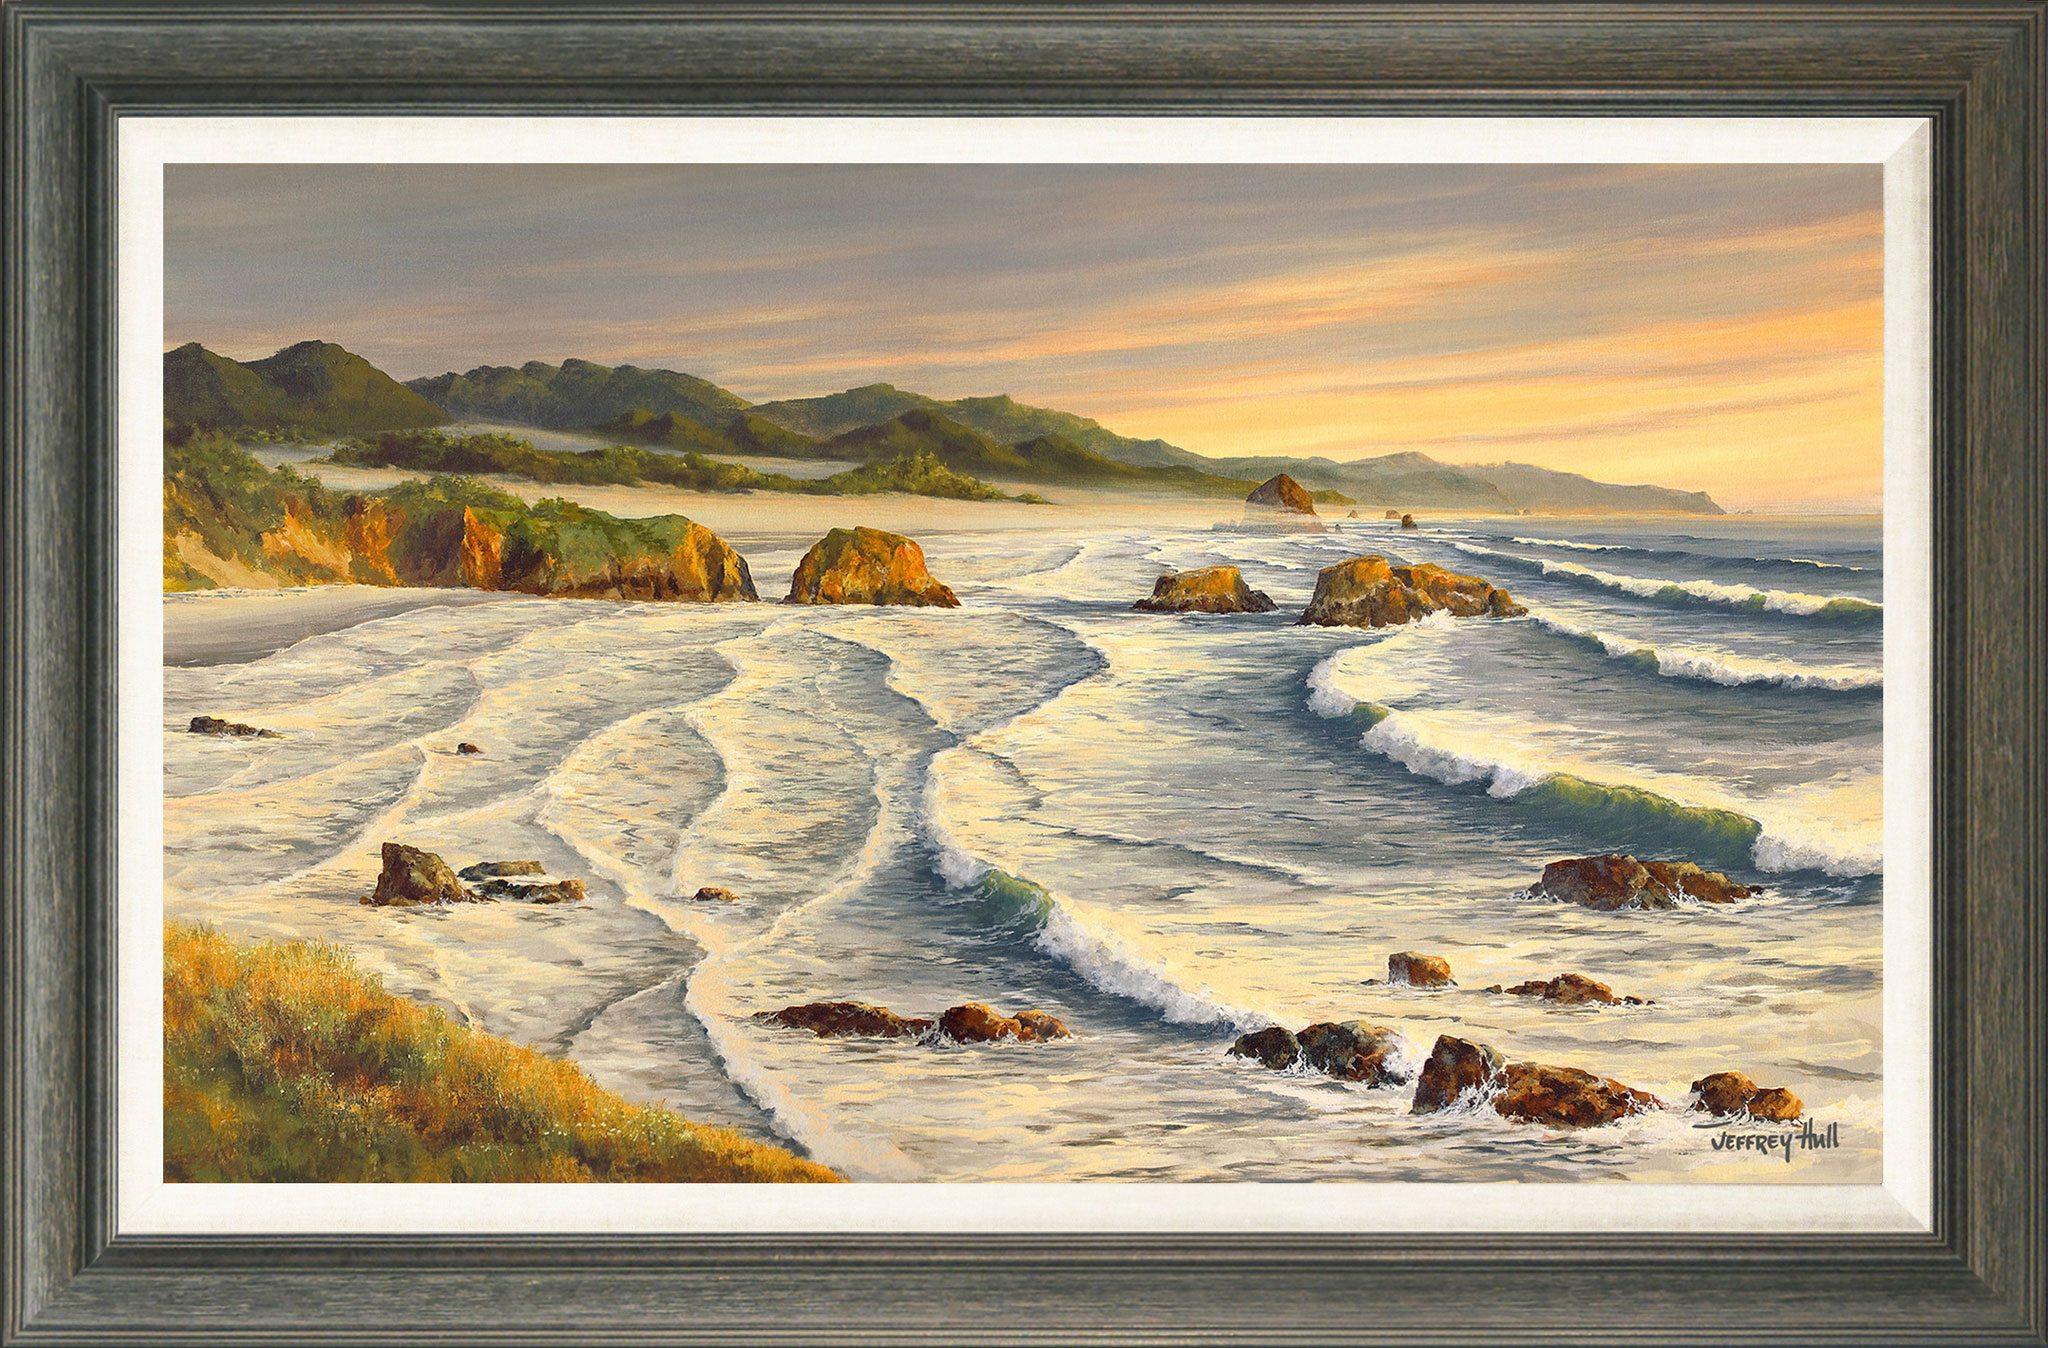 Golden-Evening-OpenEd-Cascade-White-Liner-4-Website-2021